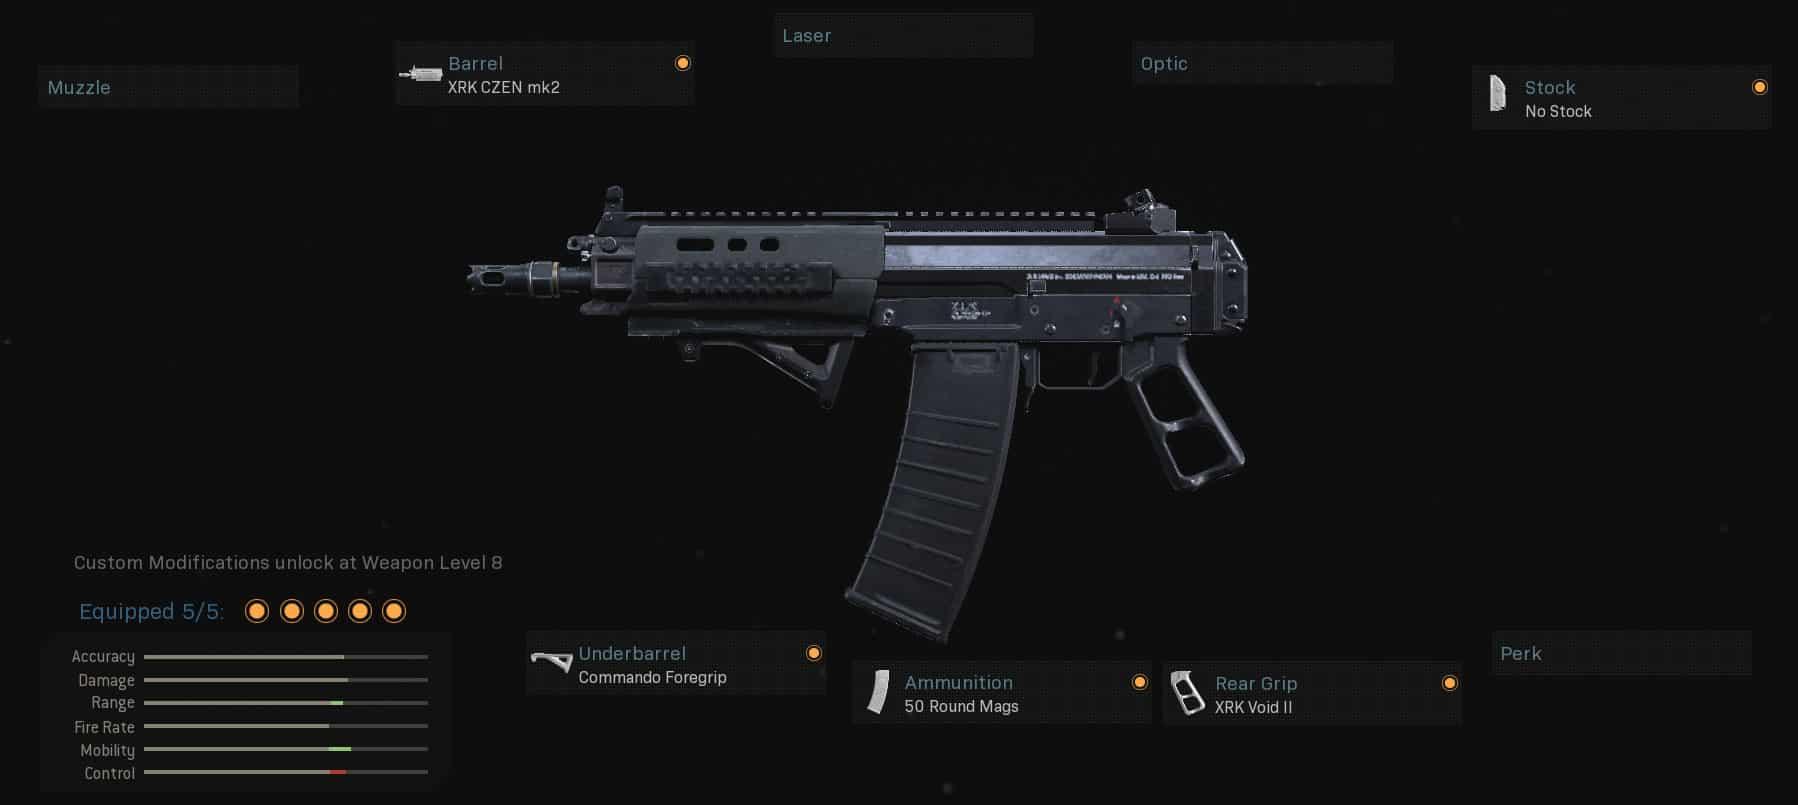 cod-call-of-duty-modern-warfare-grau-5.56-meilleurs-loadout-attachments-mod-1